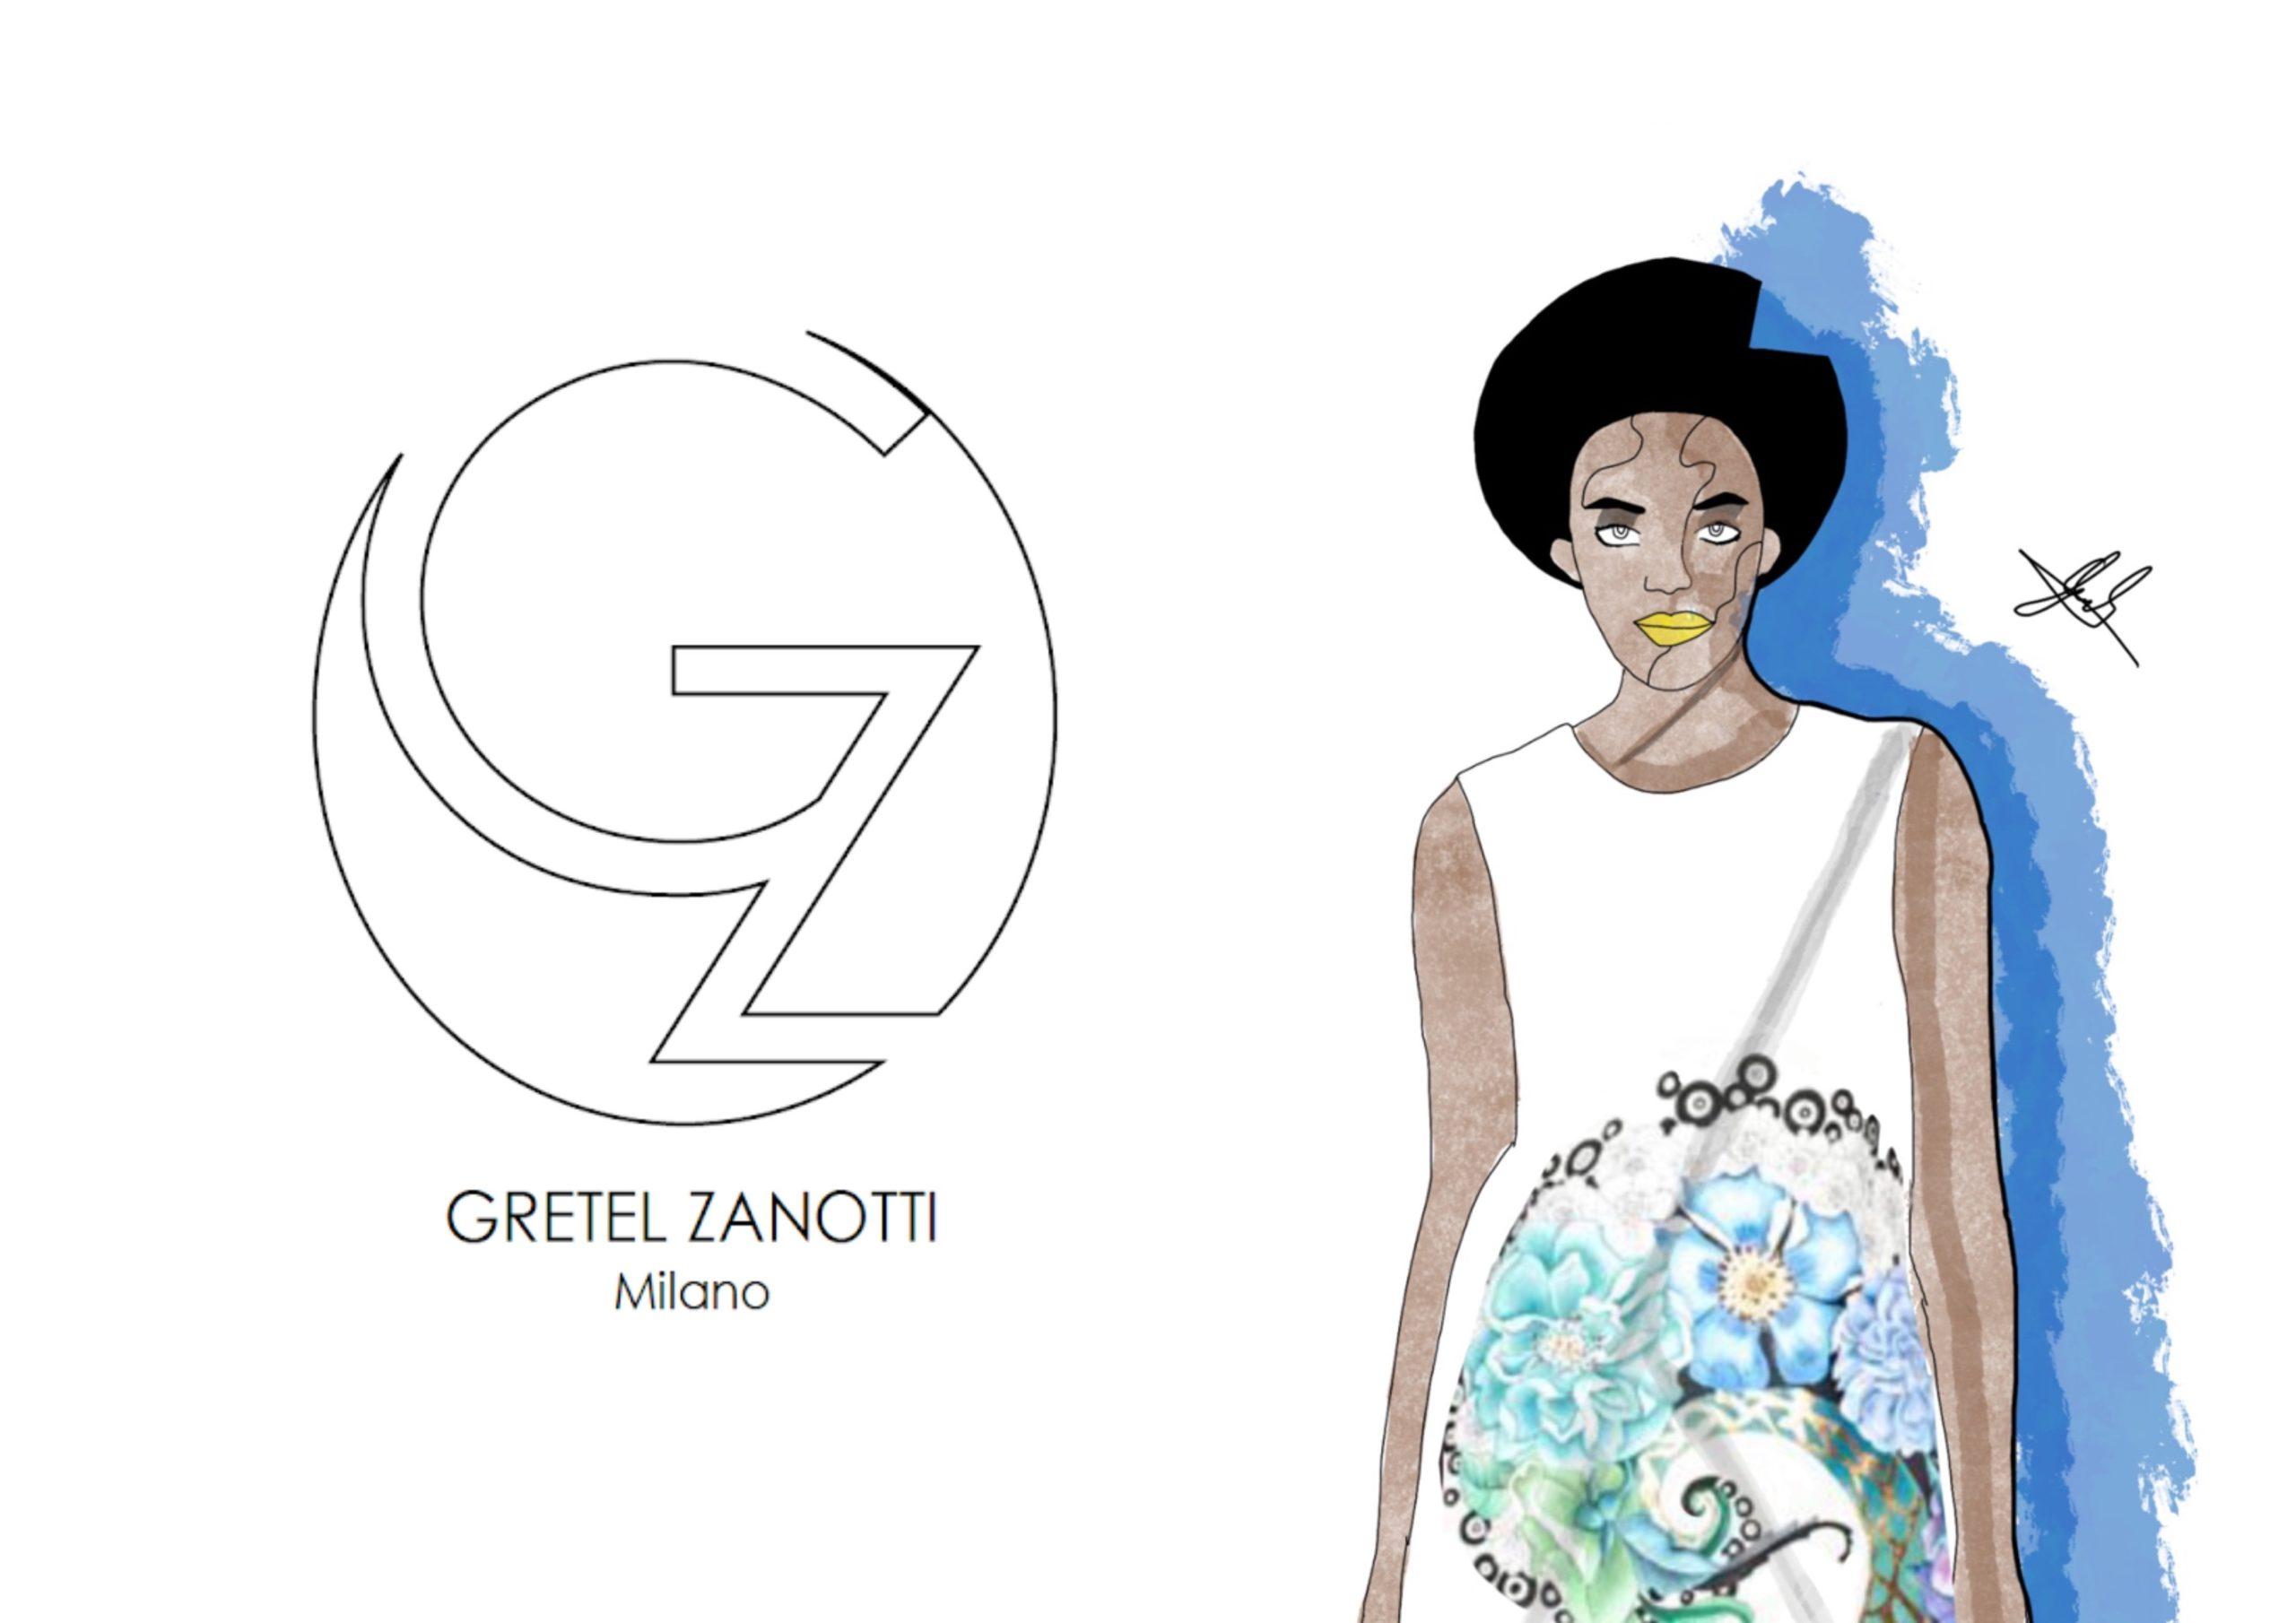 Fashion Illustration of a Black Model by Gabriele Melodia of Gretel Zanotti creative entrepreneur